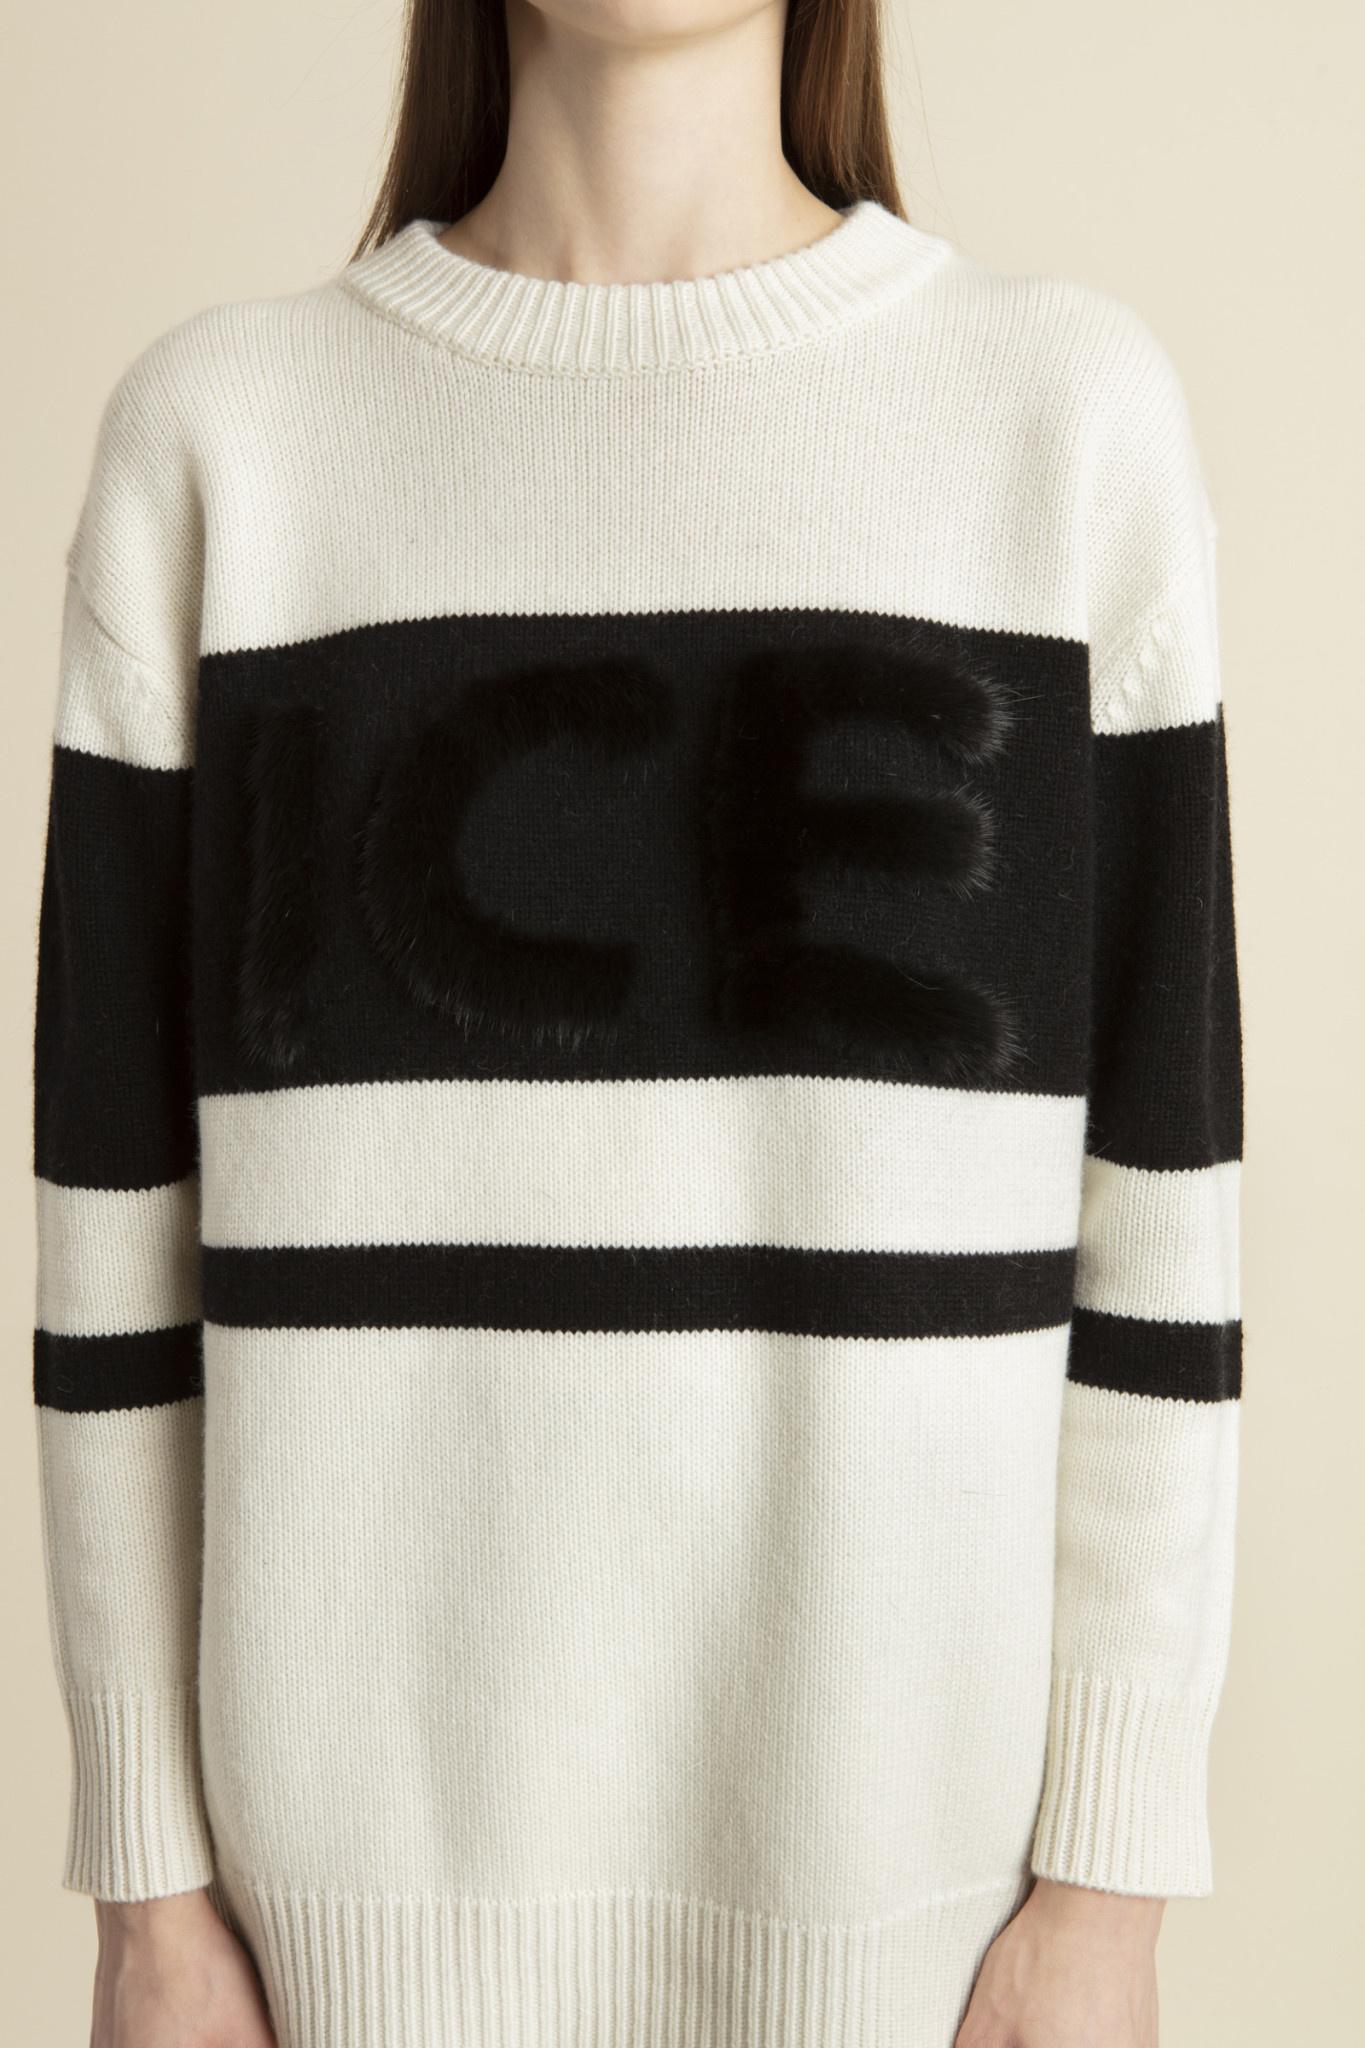 Proust sweater Max et MOi-3